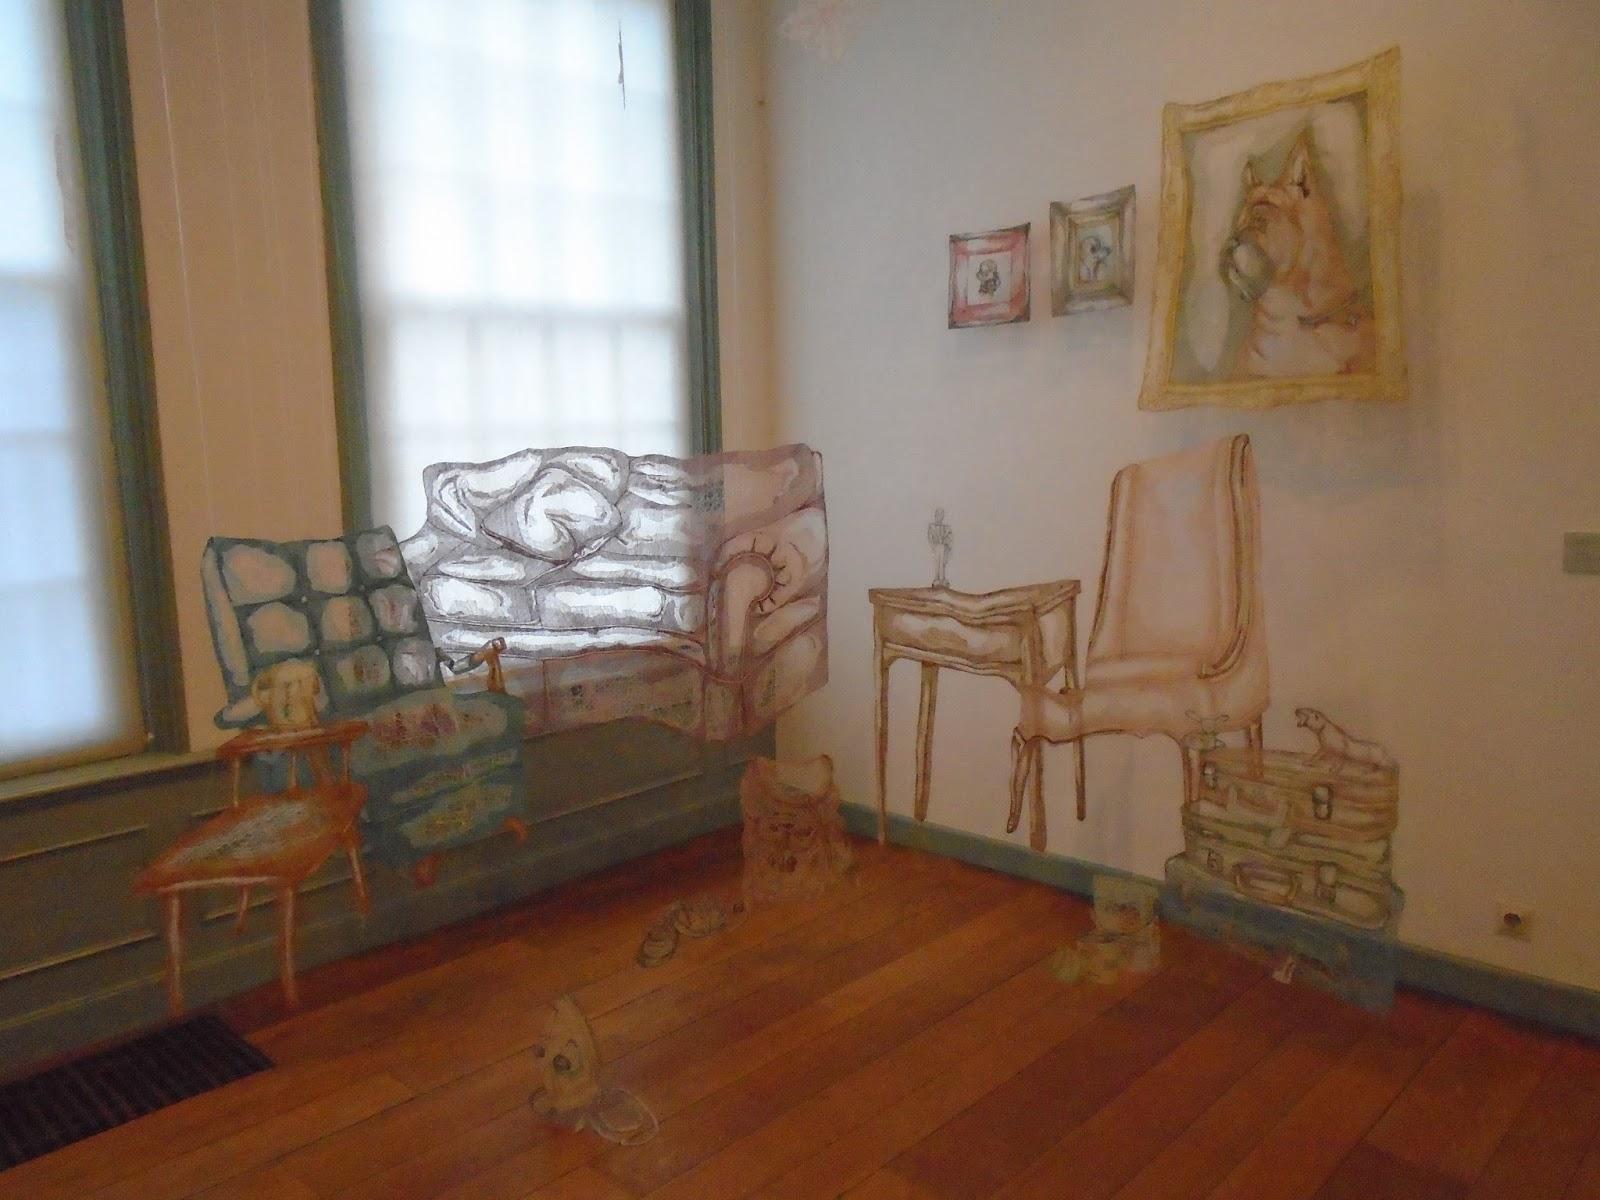 Amanda McCavour Rijswijk Textile Biennial